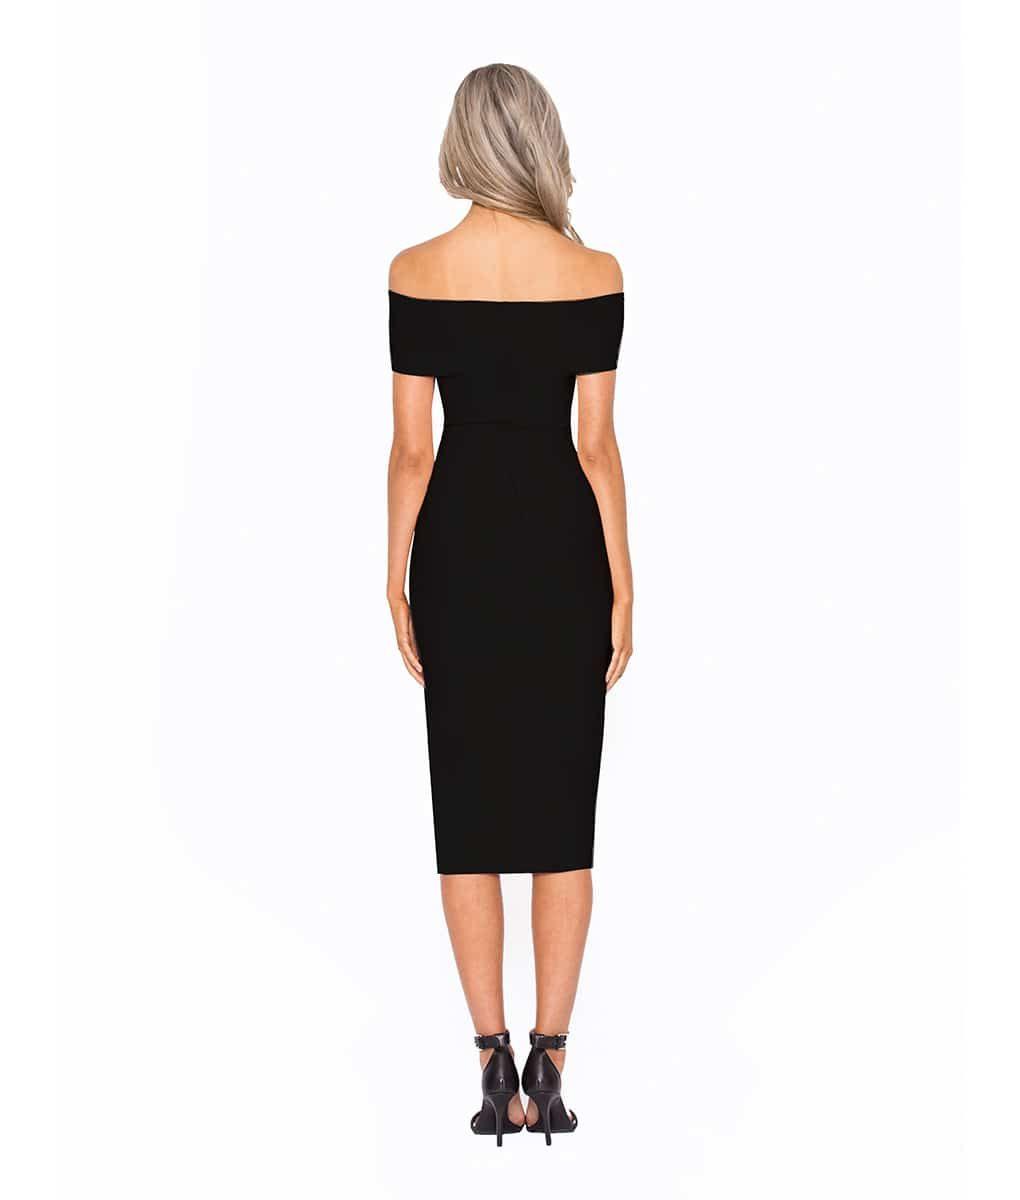 Alila Boutique Black Bardot Bodycon Midi dress